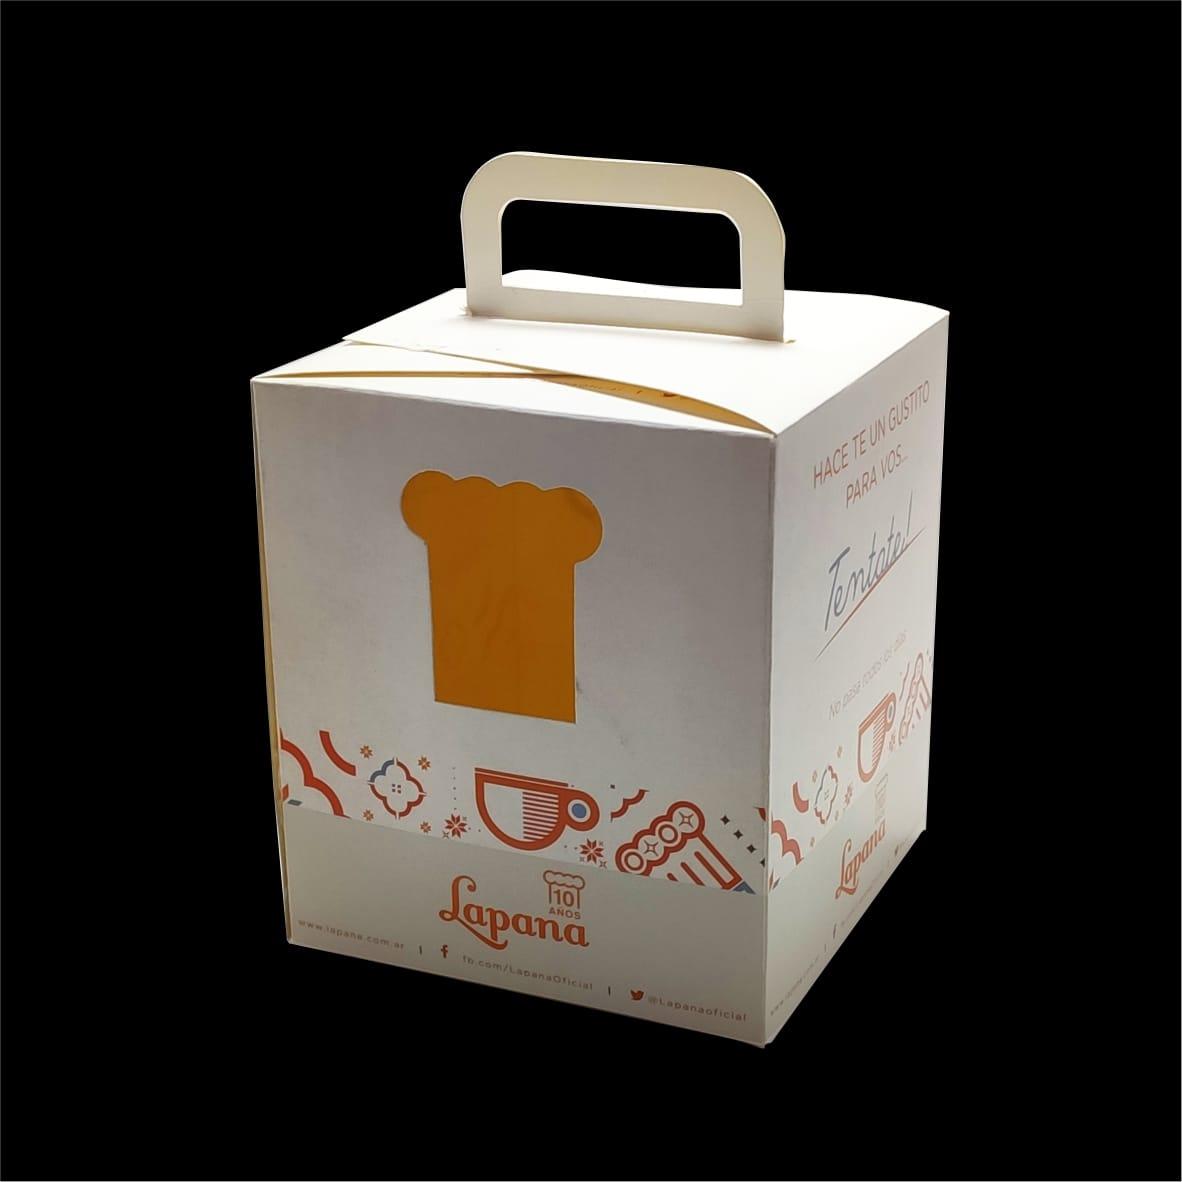 Packaging  Lapana